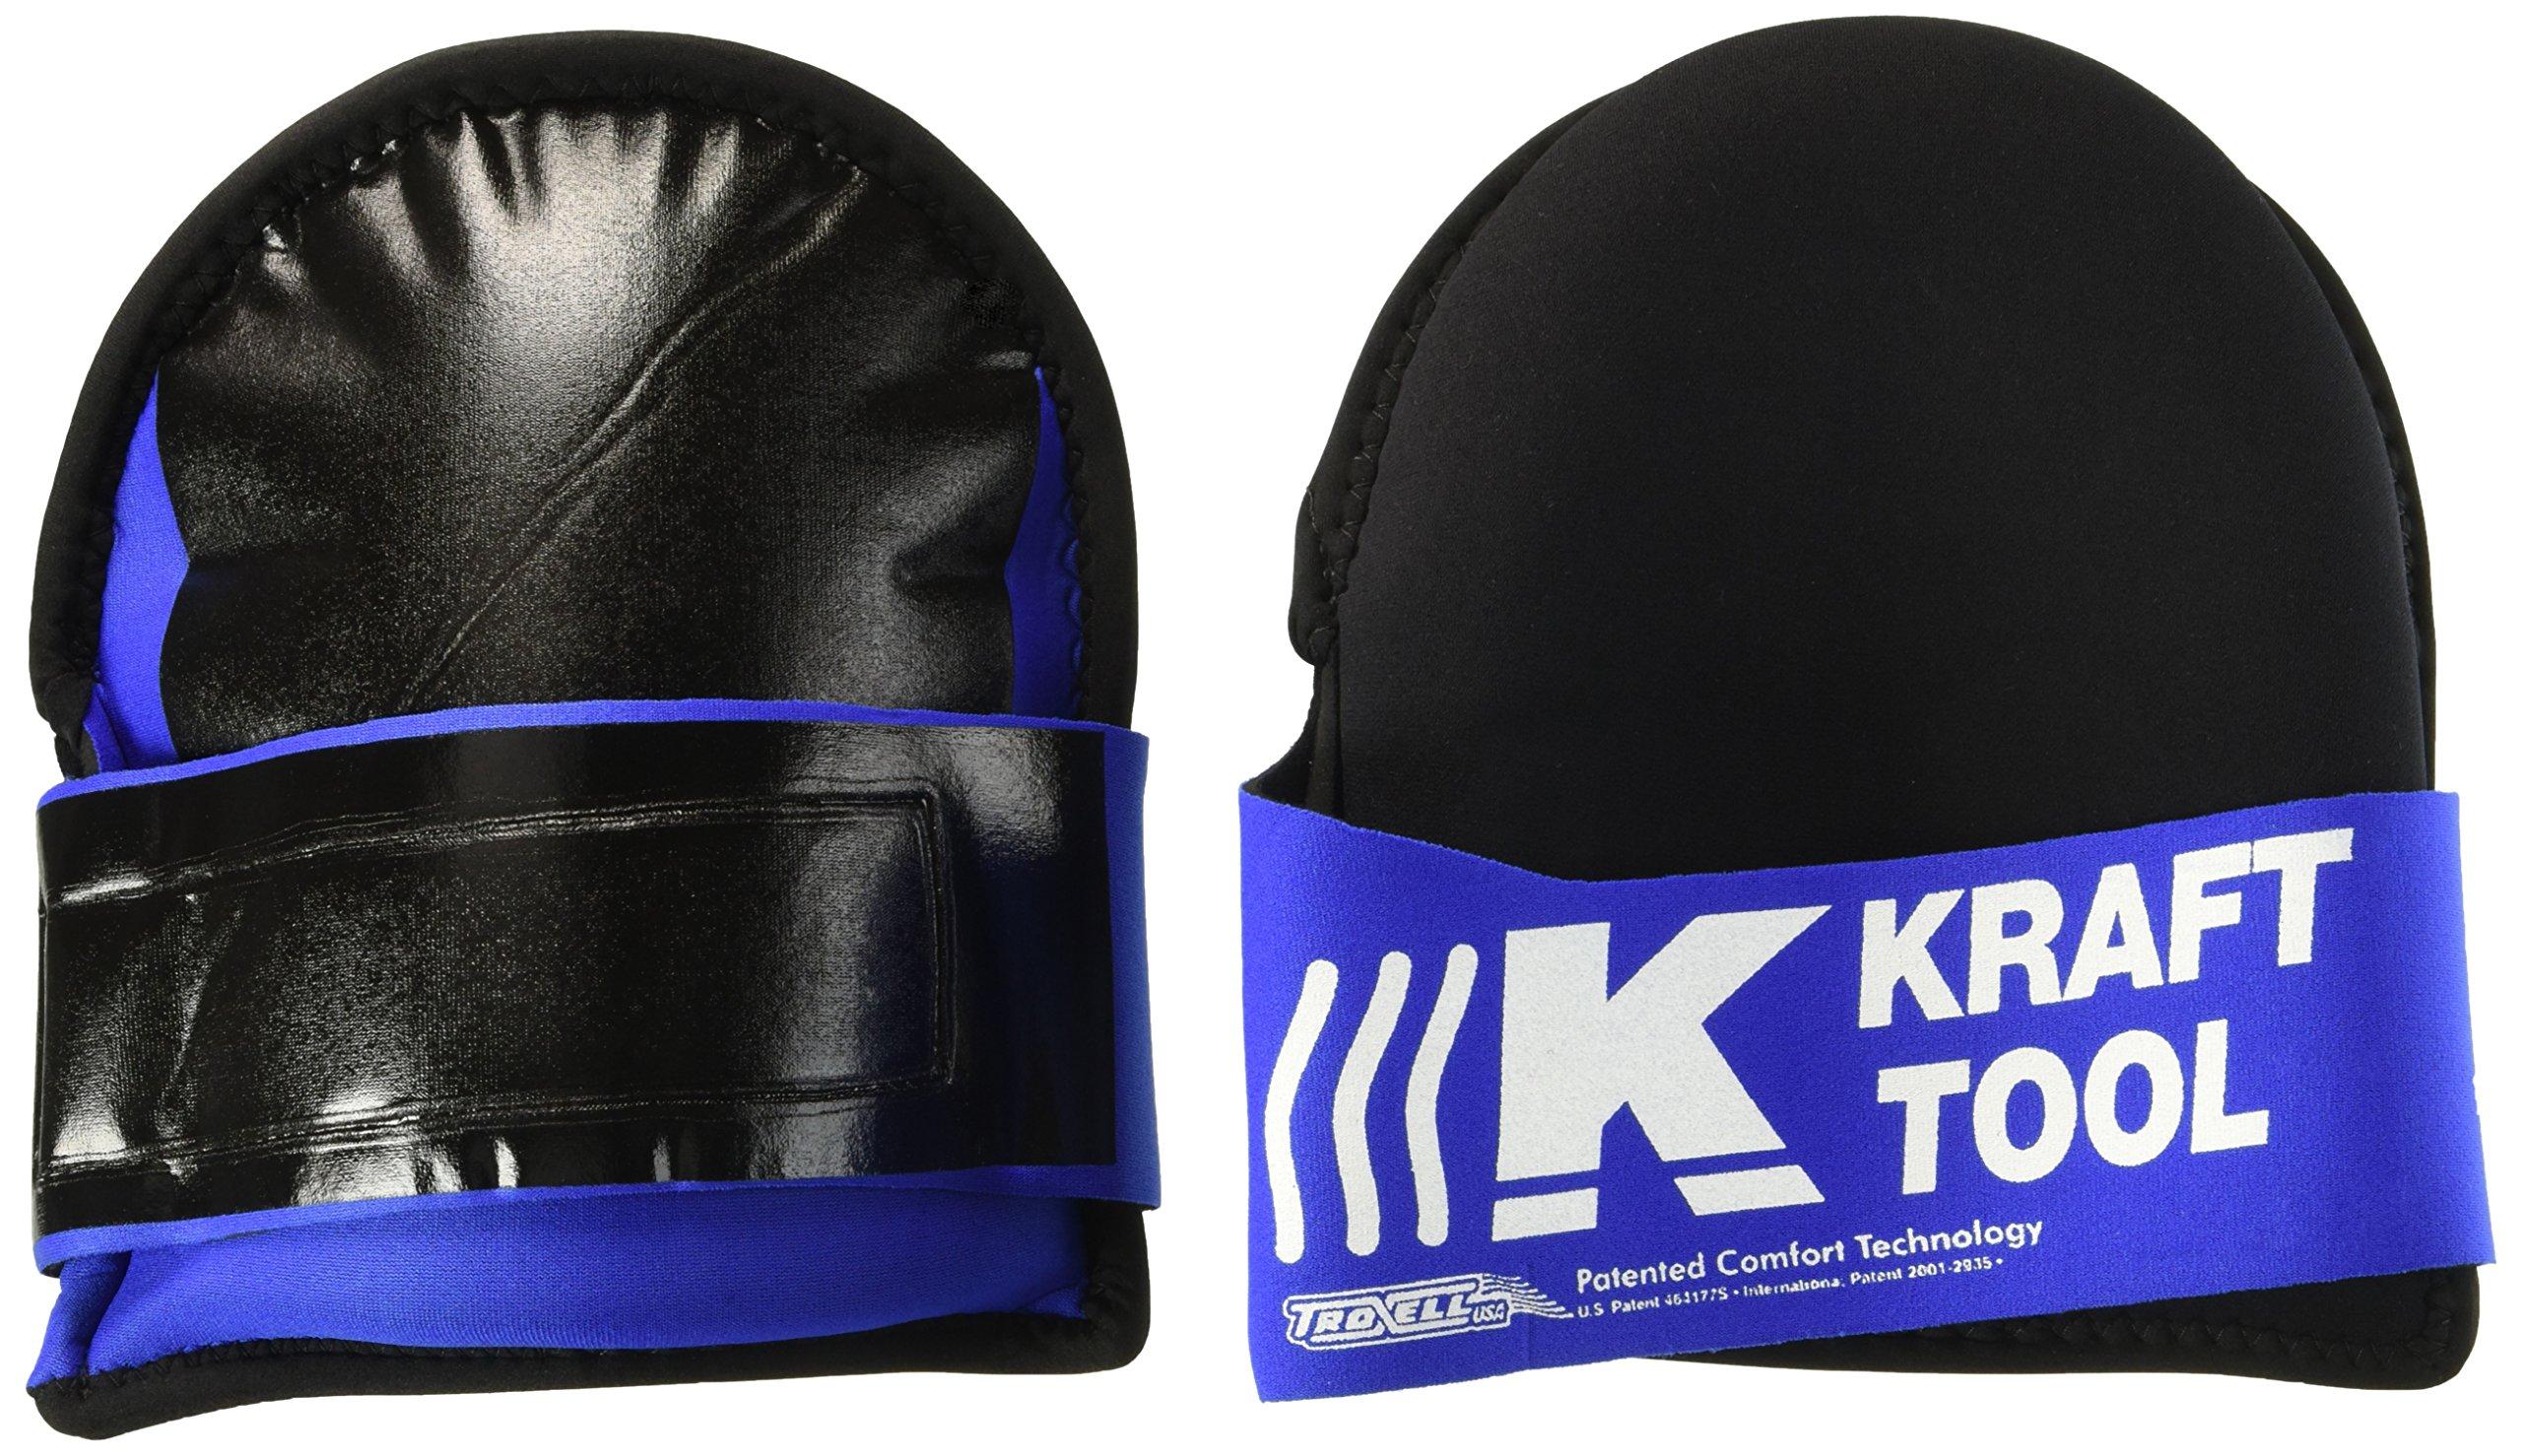 WL139 - Knee Pad Super Soft/Front Closure -pair by Kraft Tool